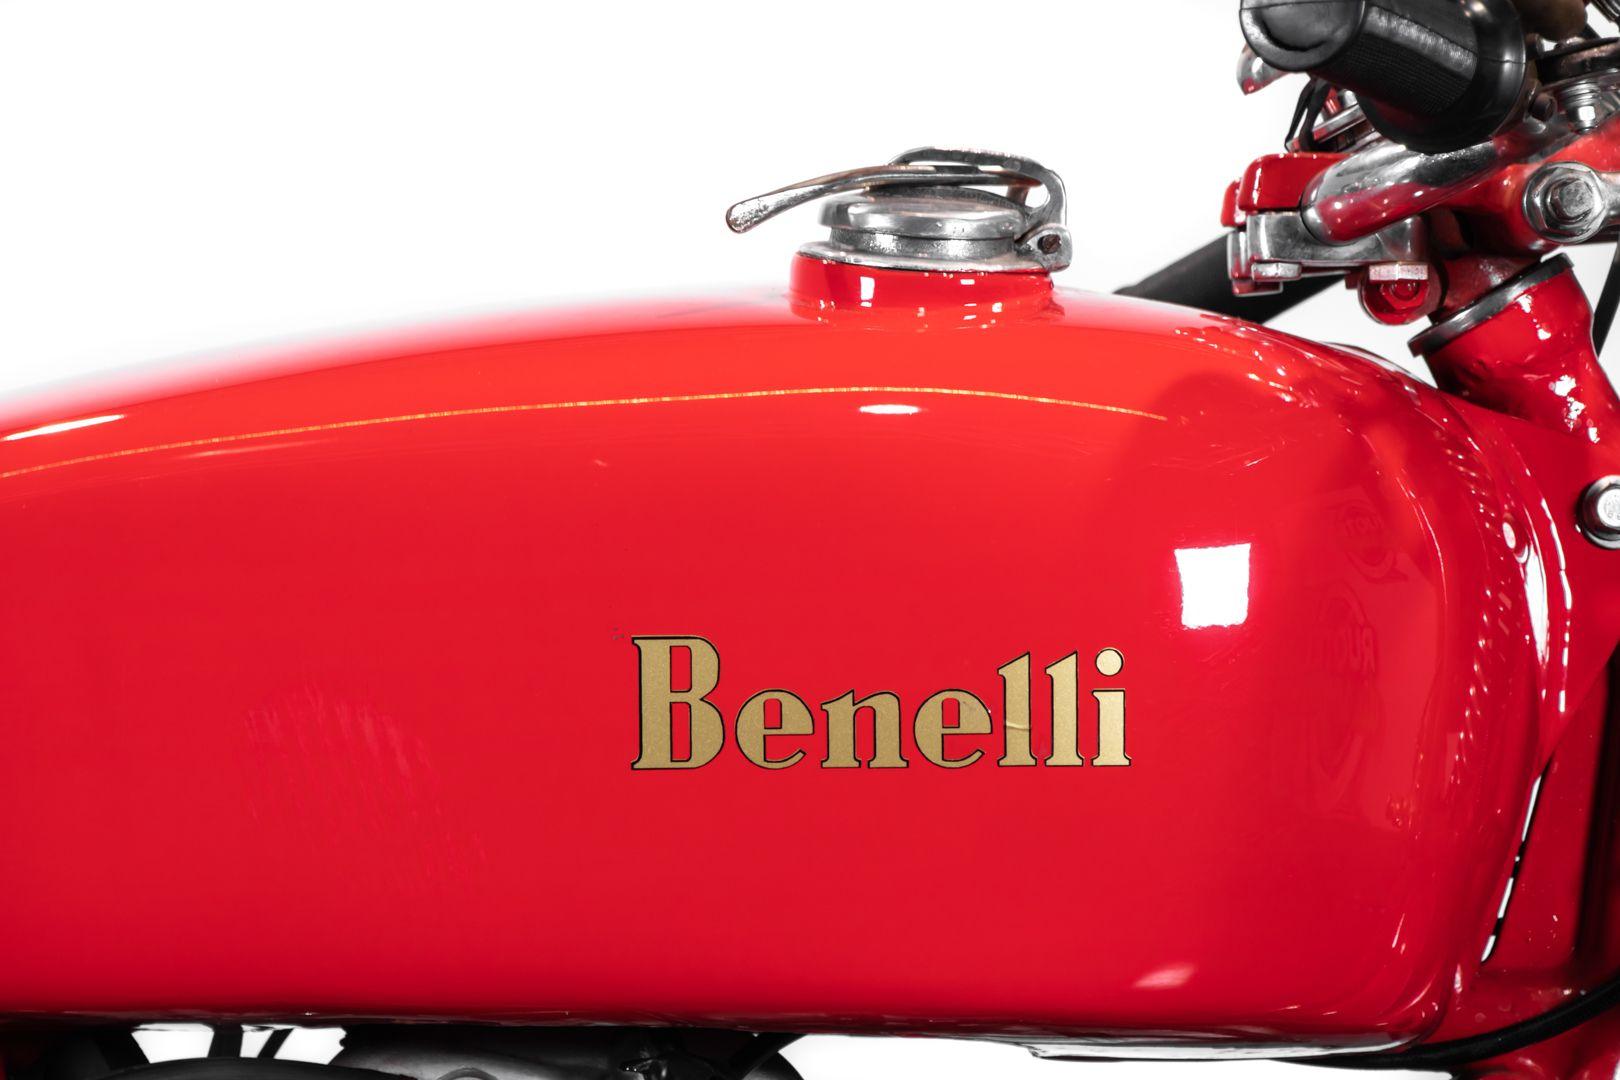 1938 Benelli 250 SS Bialbero 77289